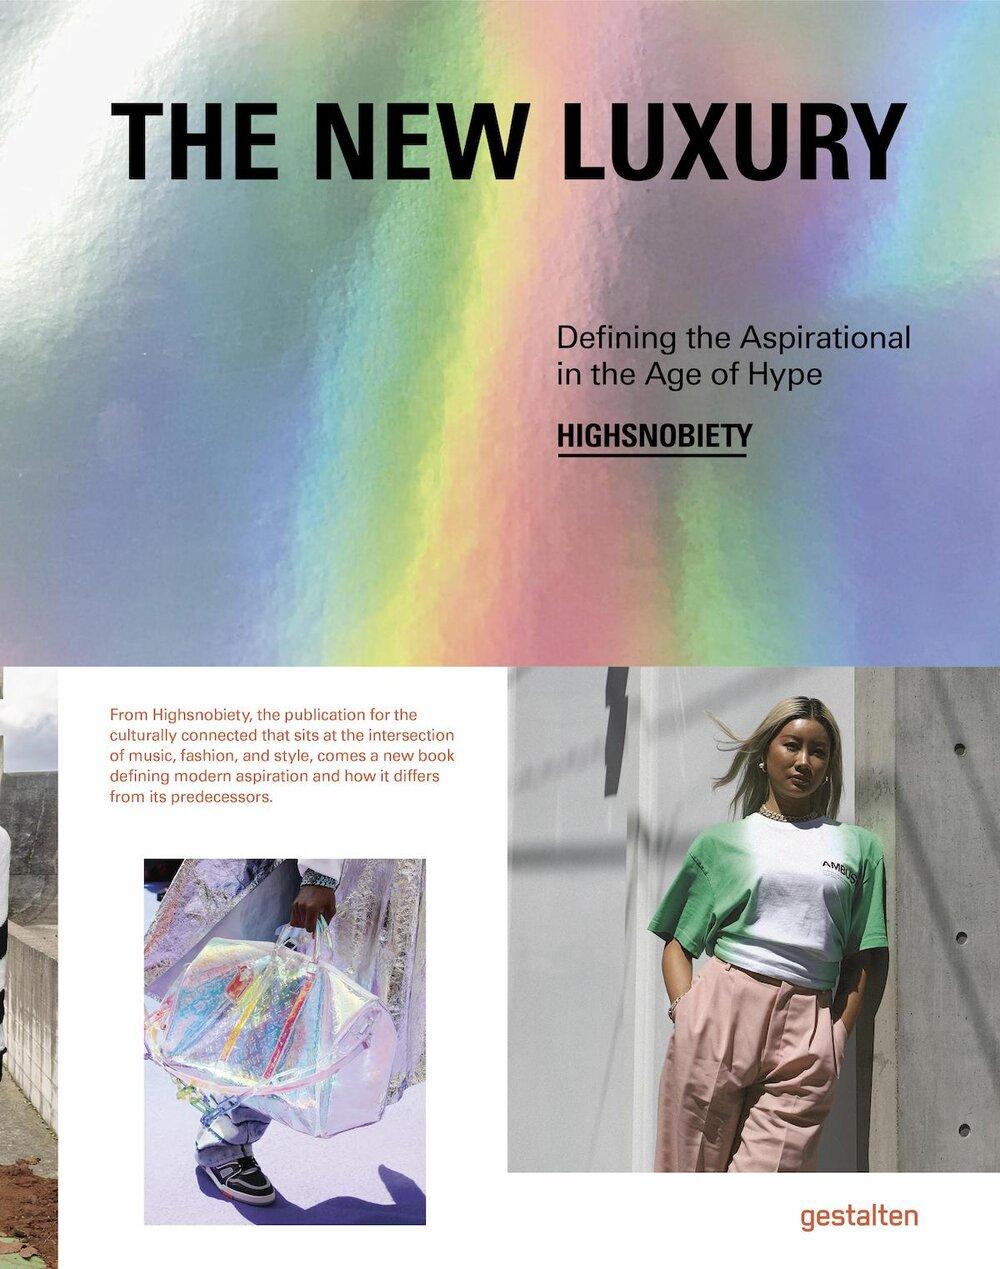 the new luxury - GESTALTEN cover